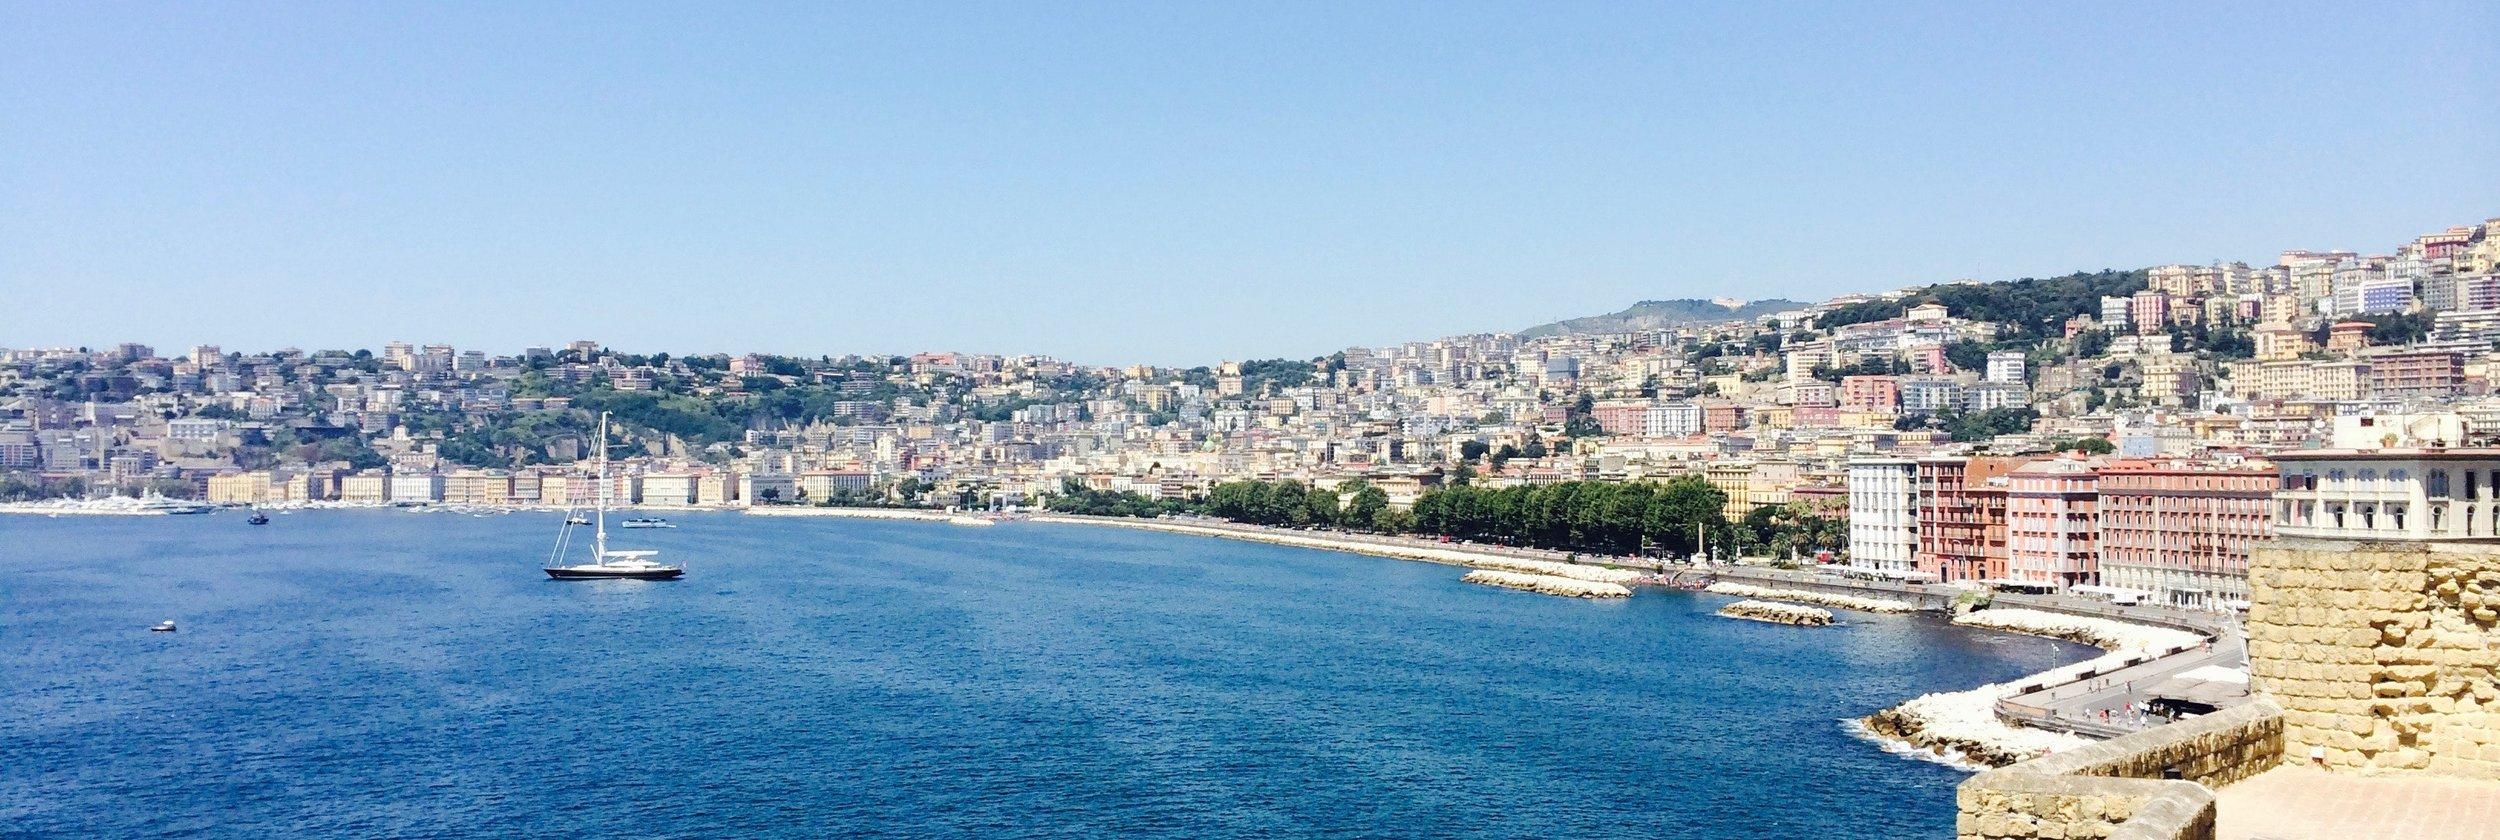 Cosenza coast line